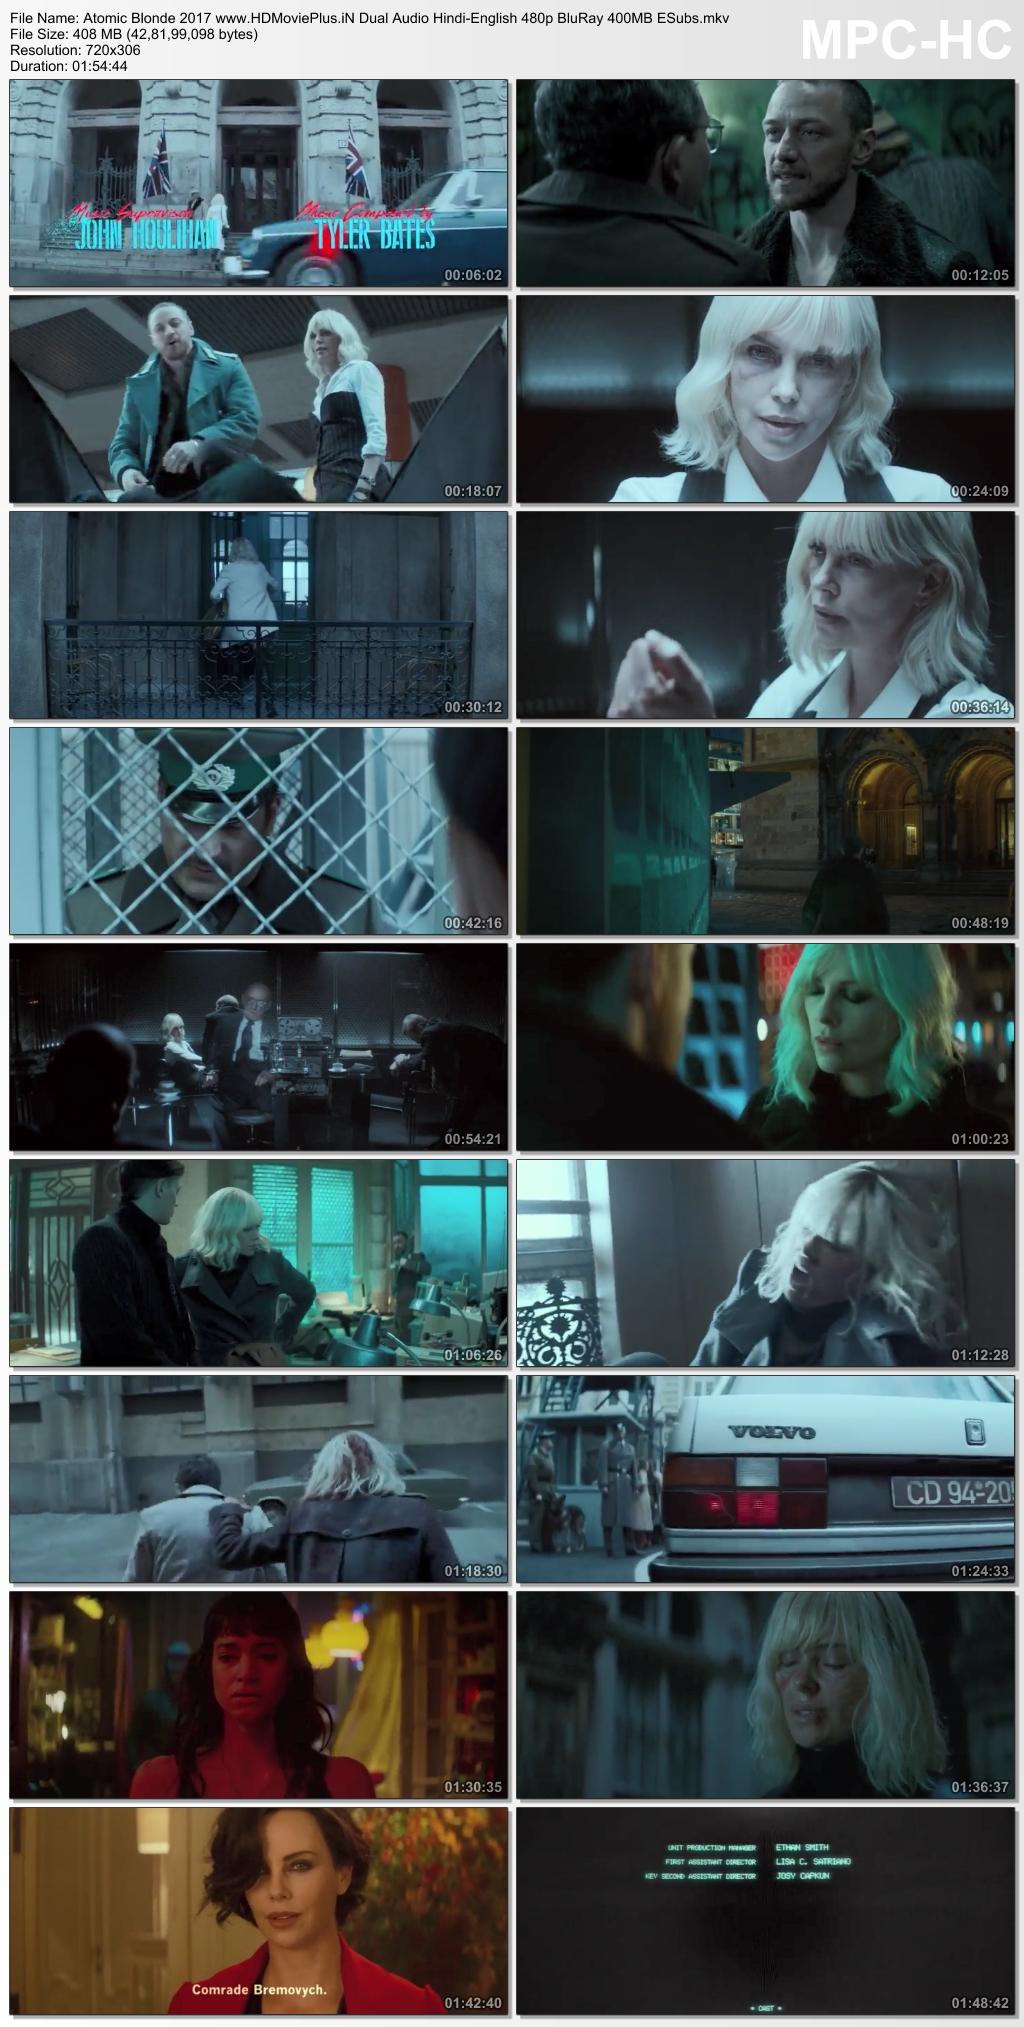 Atomic Blonde 2017 Dual Audio